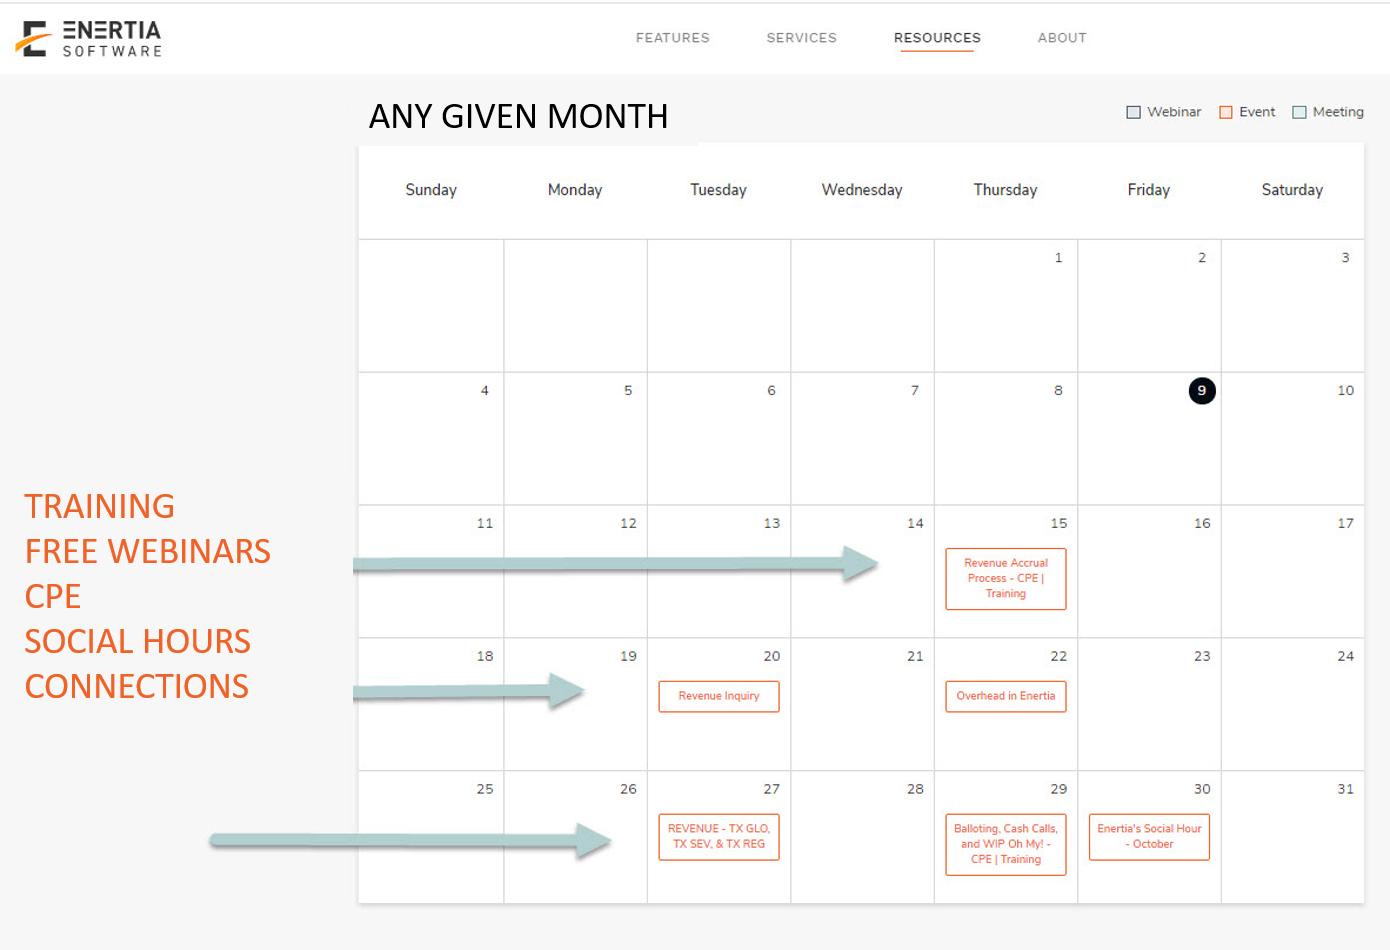 Calendar of Events Enertia Live ANY month